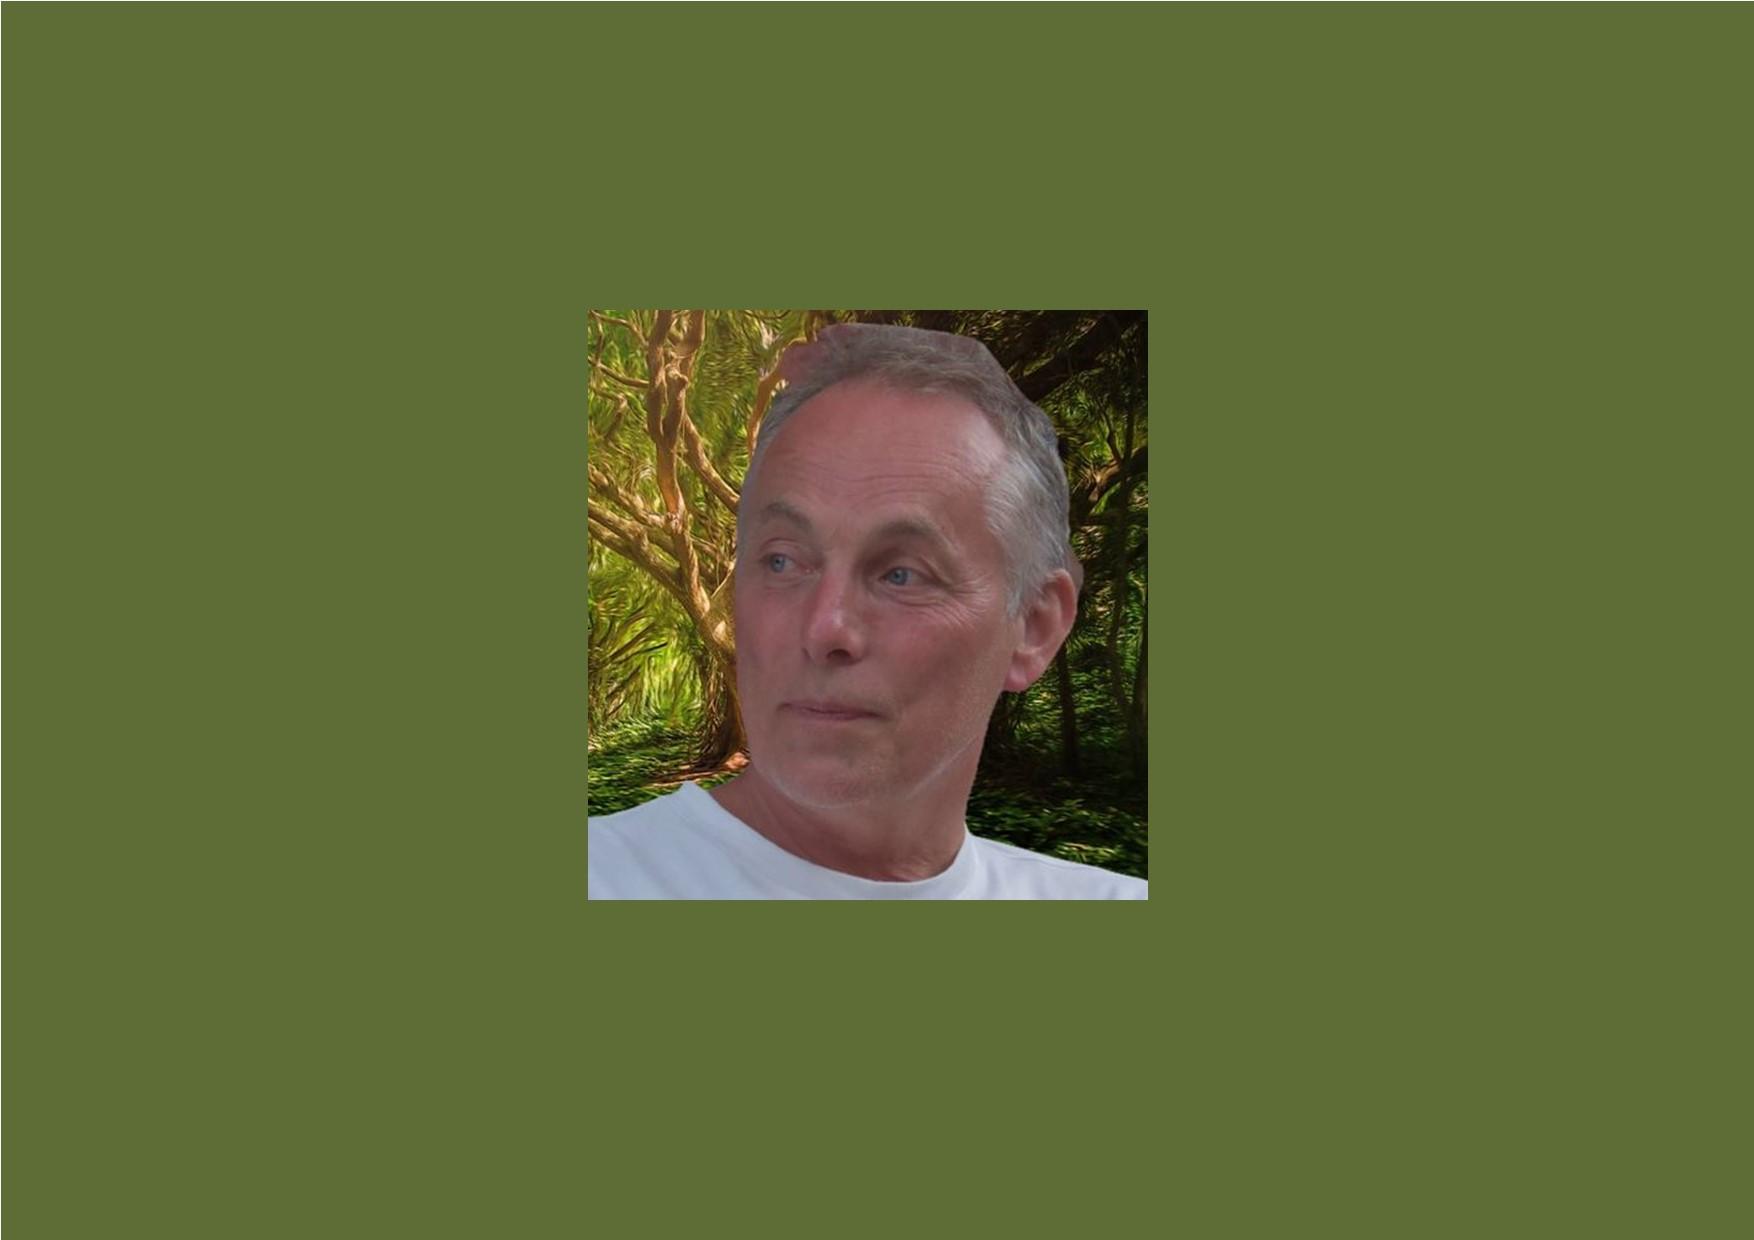 <p>ICT-coördinator: meester Filip</p>